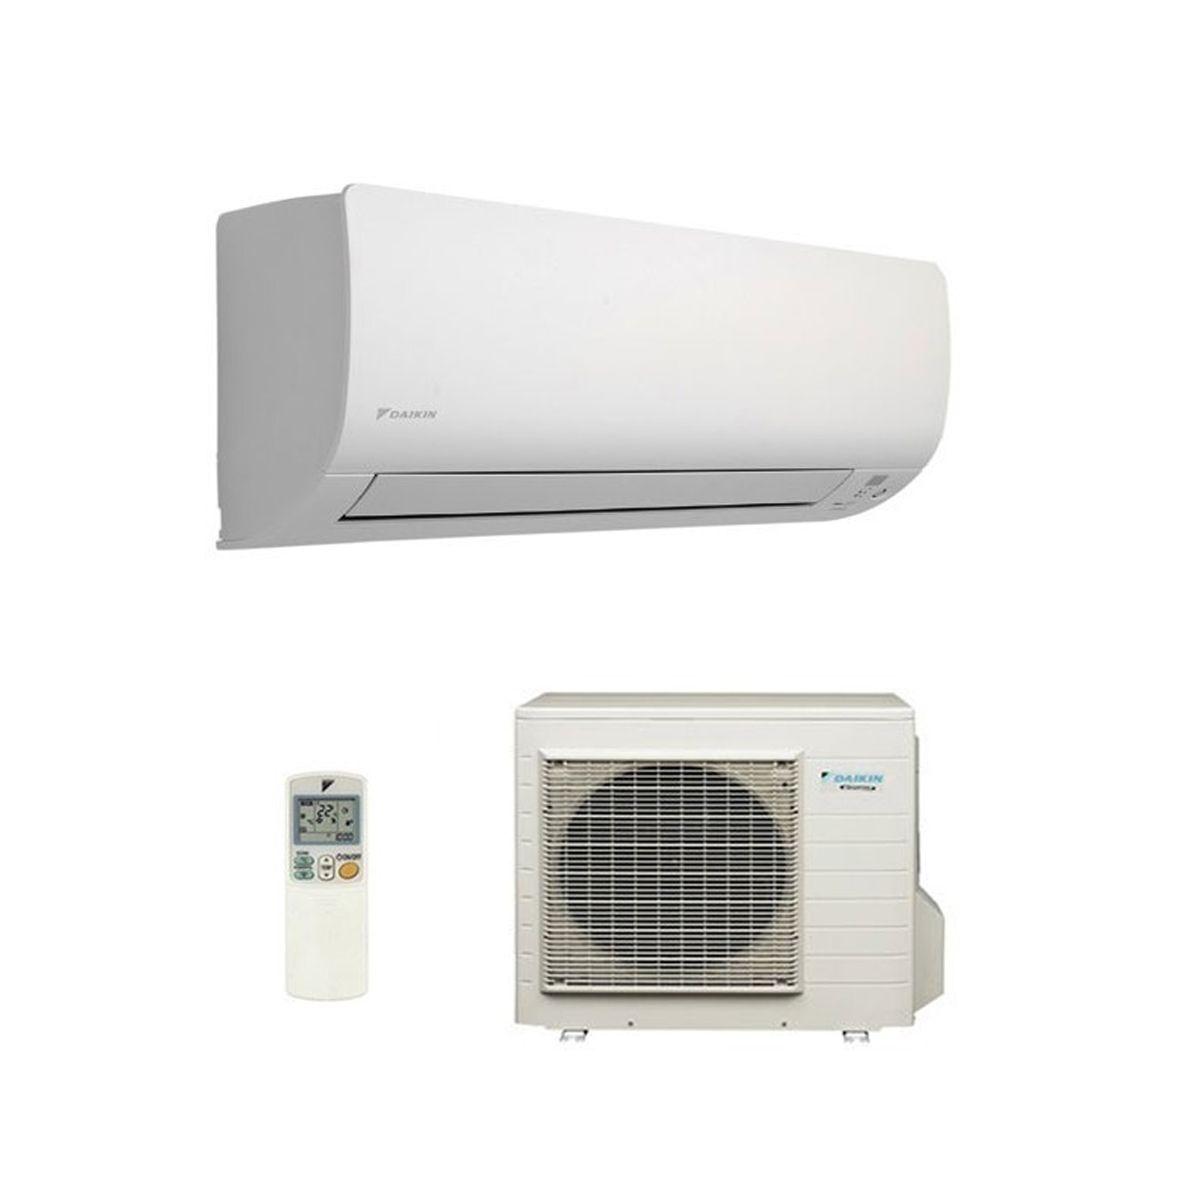 Daikin Air Conditioning Ftxs50k Wall Mounted 5kw 18000 Btu